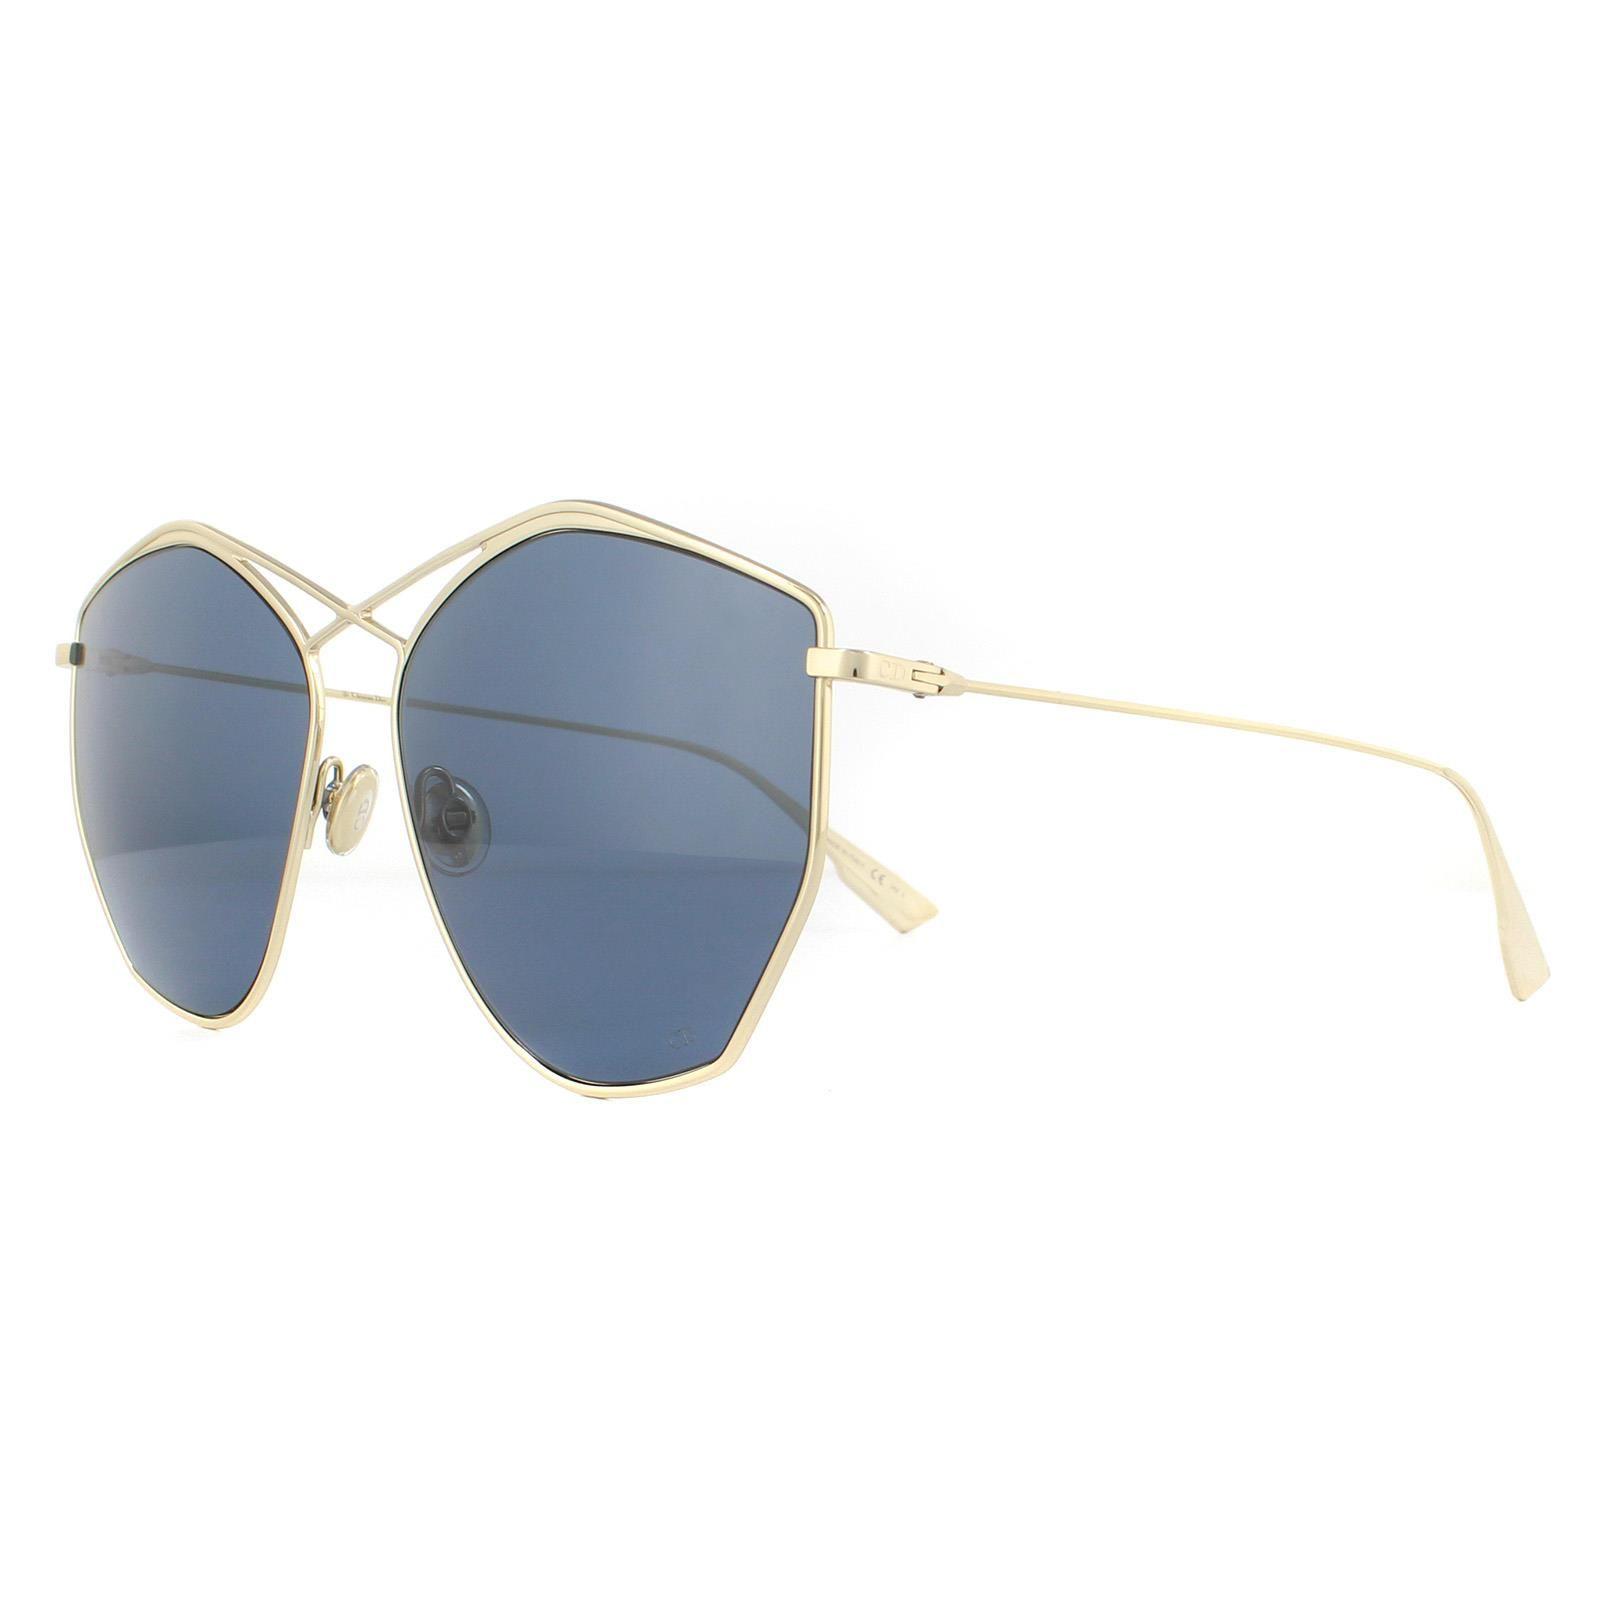 Dior Sunglasses Stellaire 4 J5G DC Gold Silver Mirror